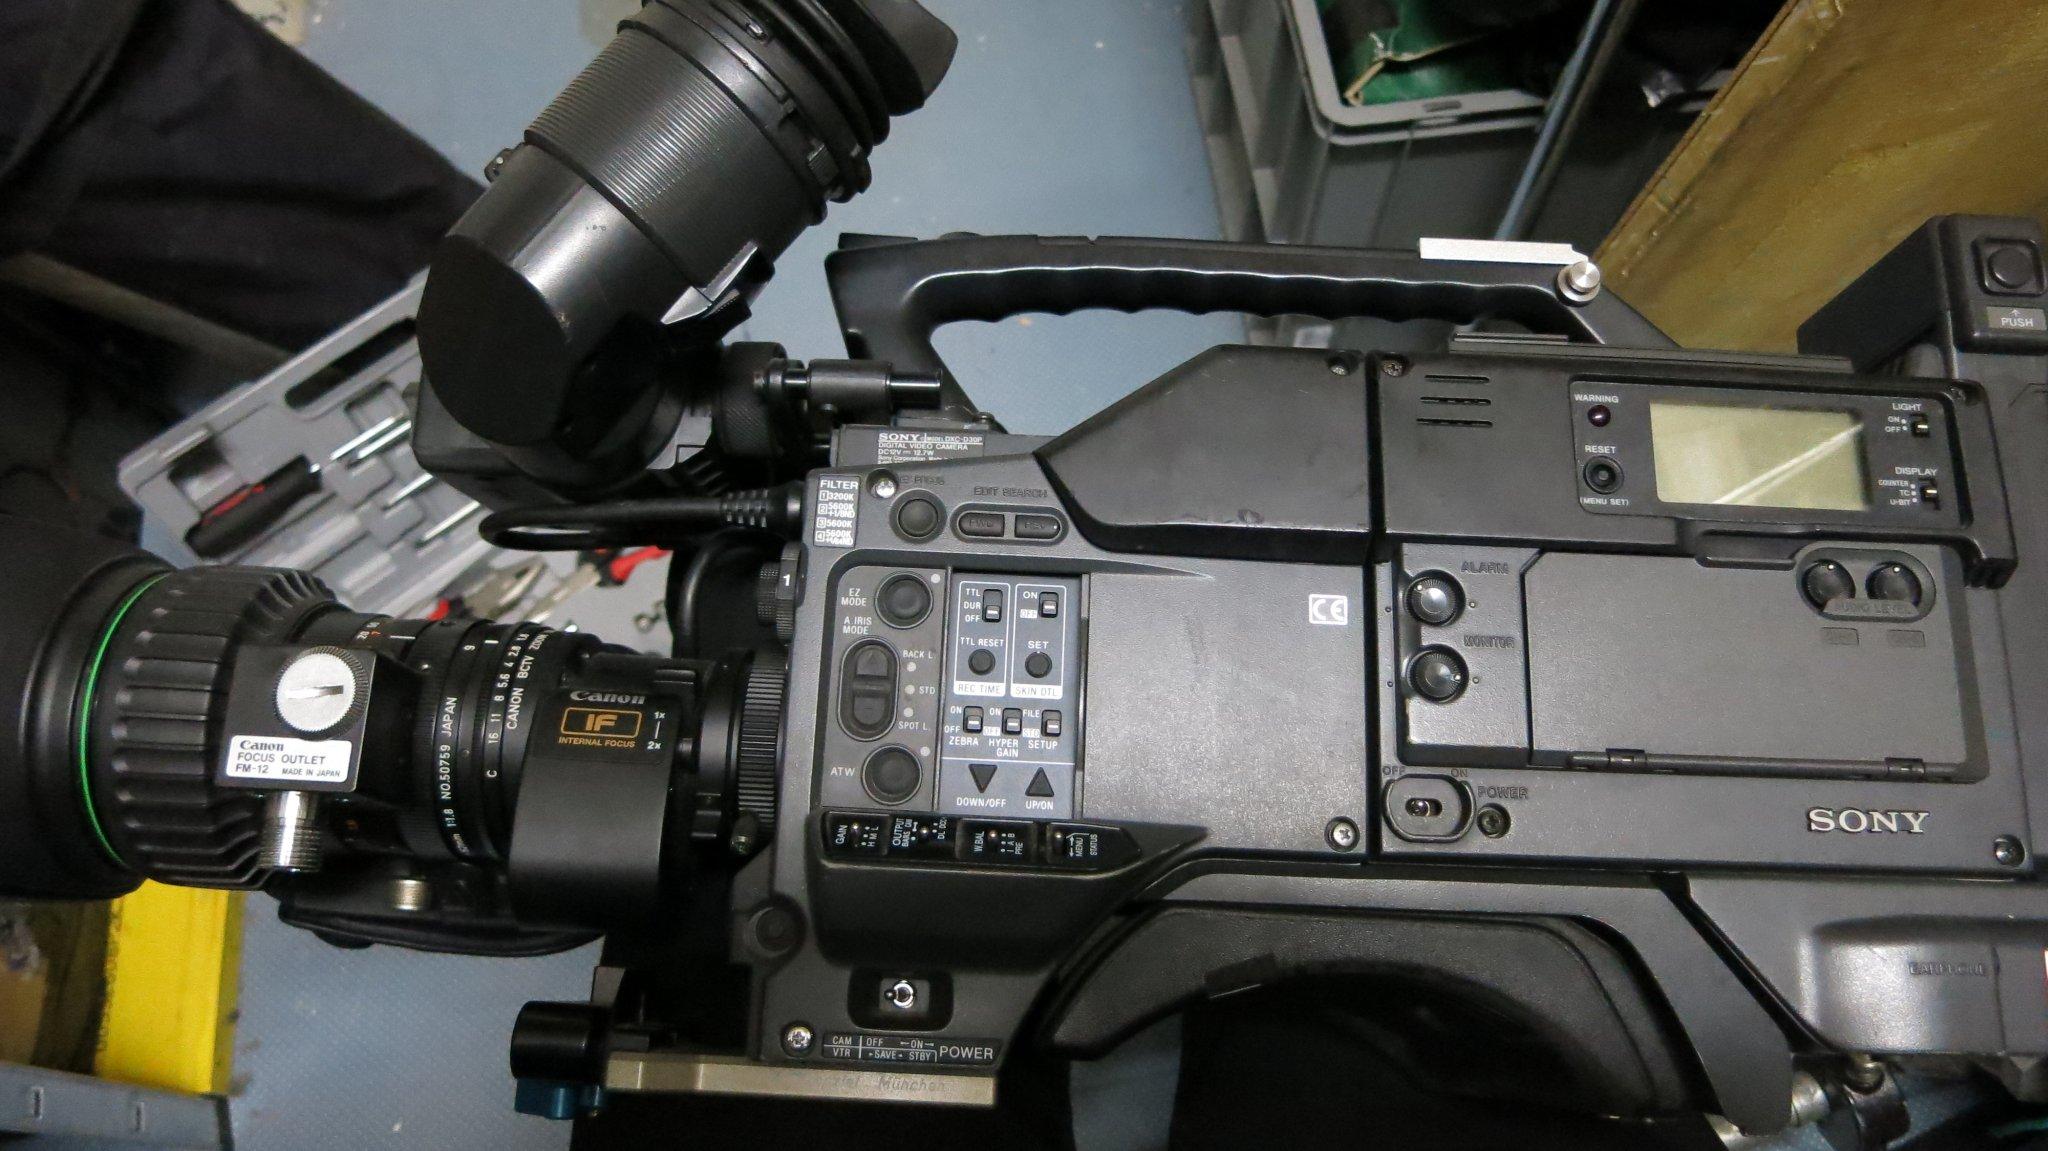 File:Sony-eng-001 jpg - apertus° wiki